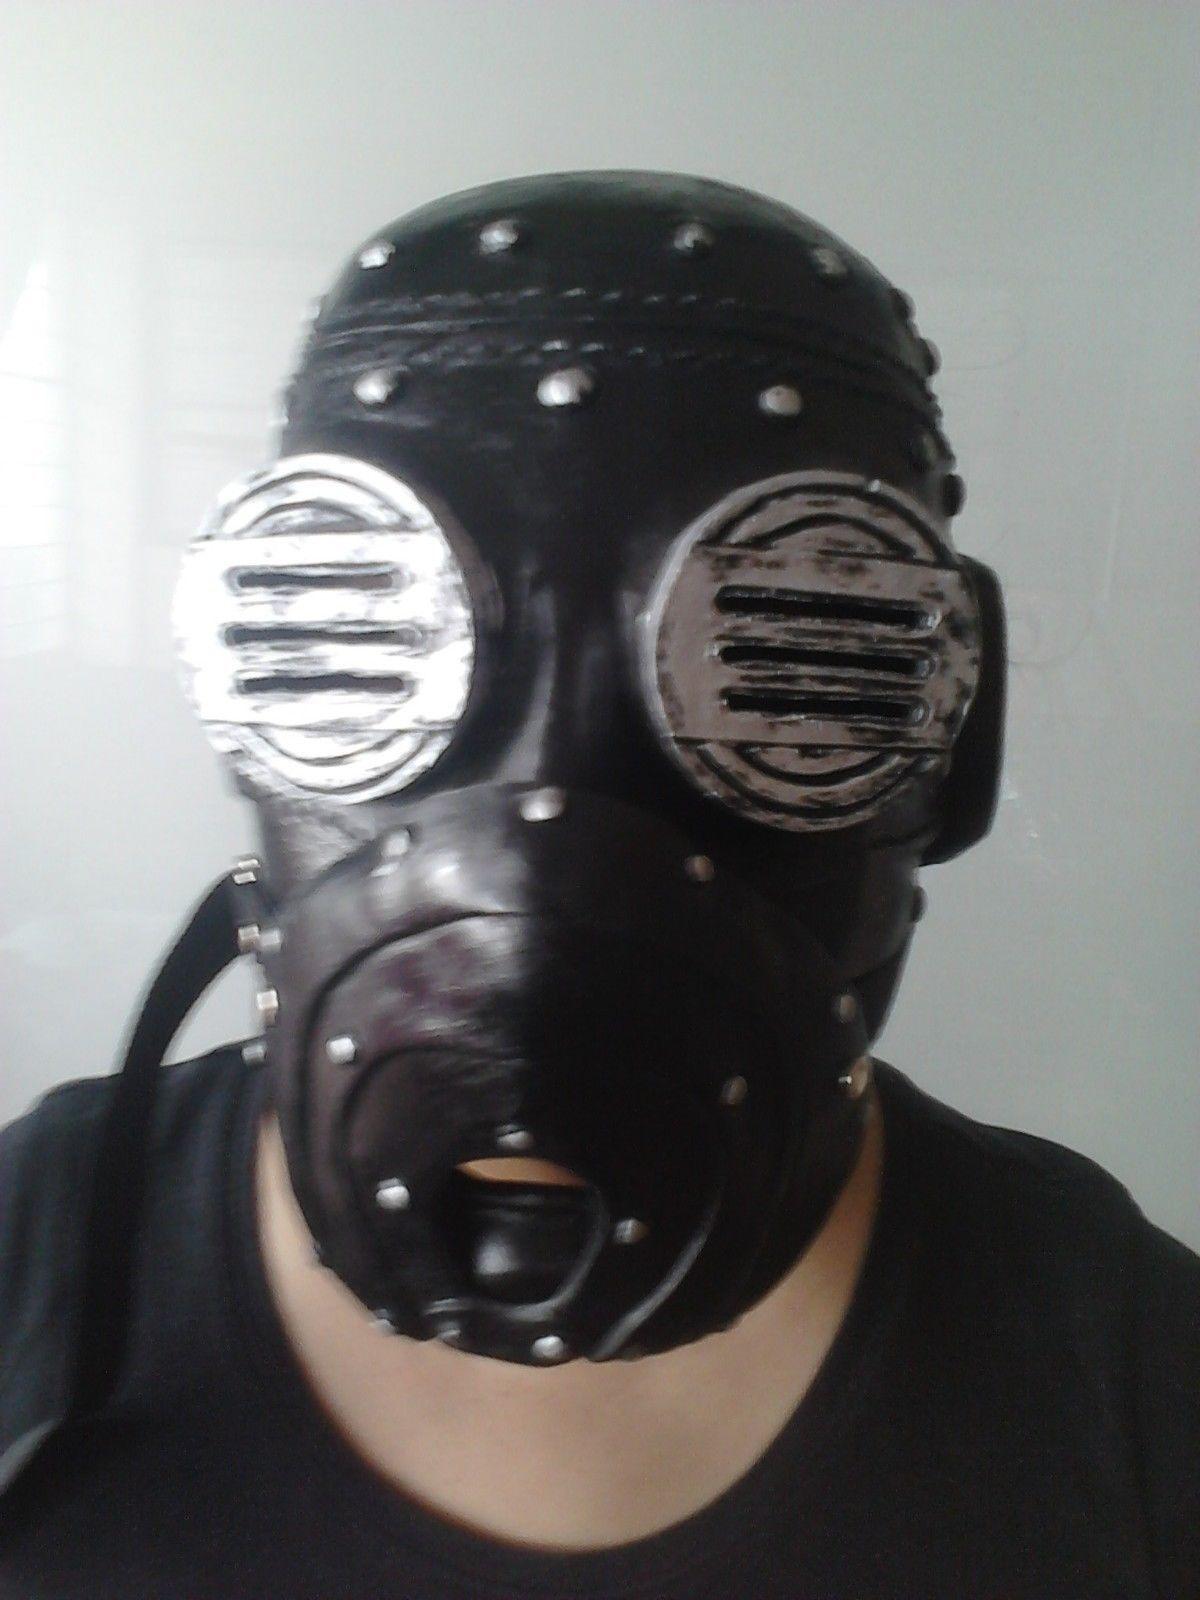 Sid Wilson Deluxe Grau Kapitel Slipknot Tour Maske Maske Maske Kostüm Verkleidung Erwachsene 9eb5ff